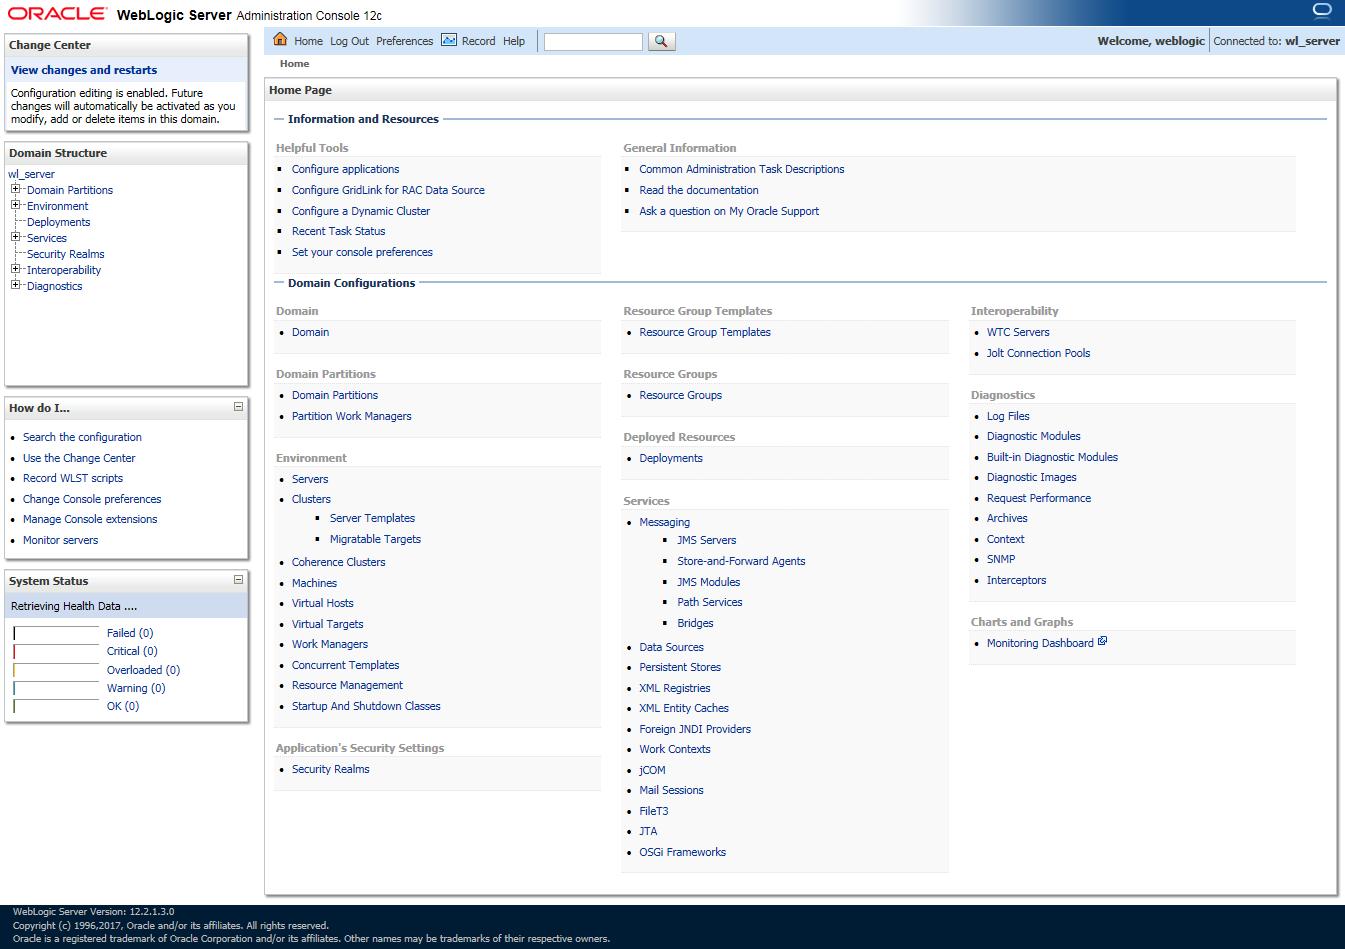 Oracle WebLogic Server Administration Console 12c - Dashboard